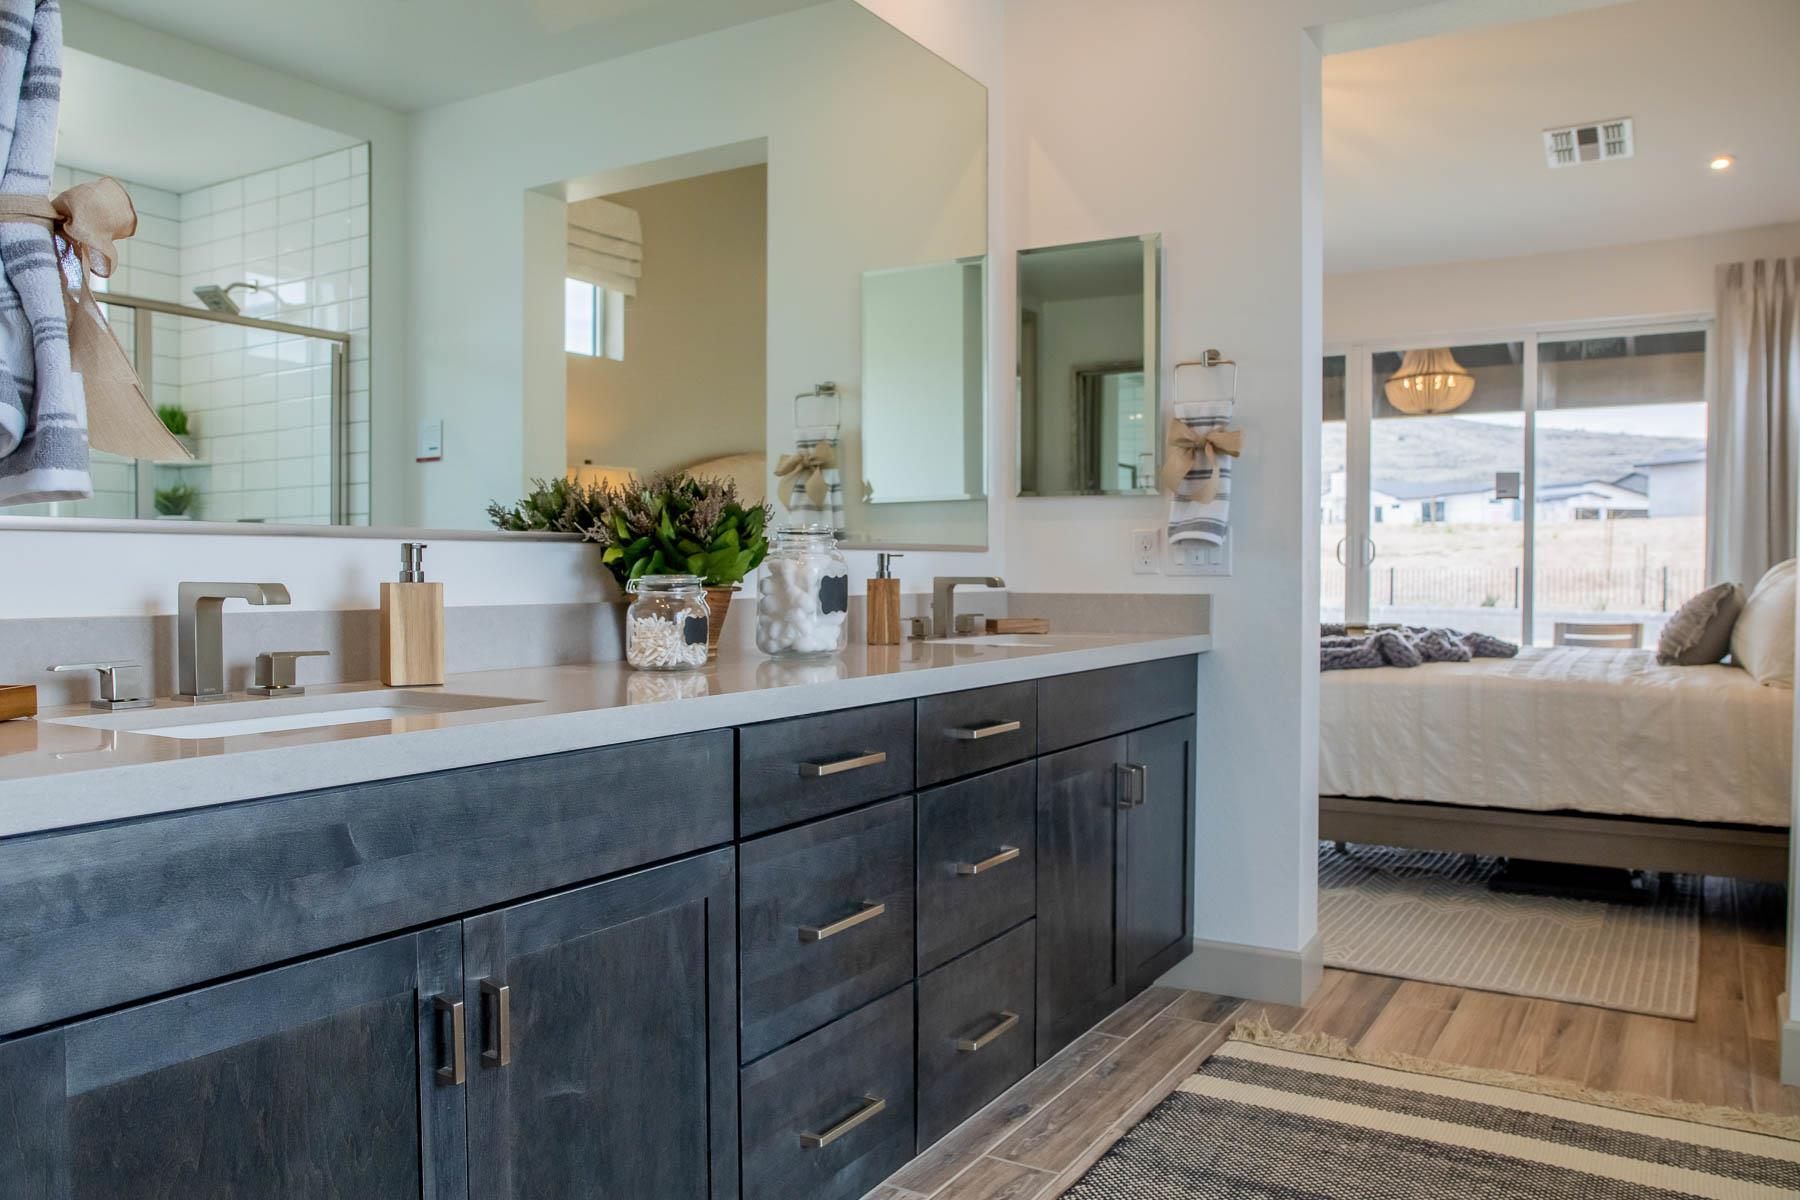 Bathroom featured in the J704 By Mandalay Homes in Prescott, AZ